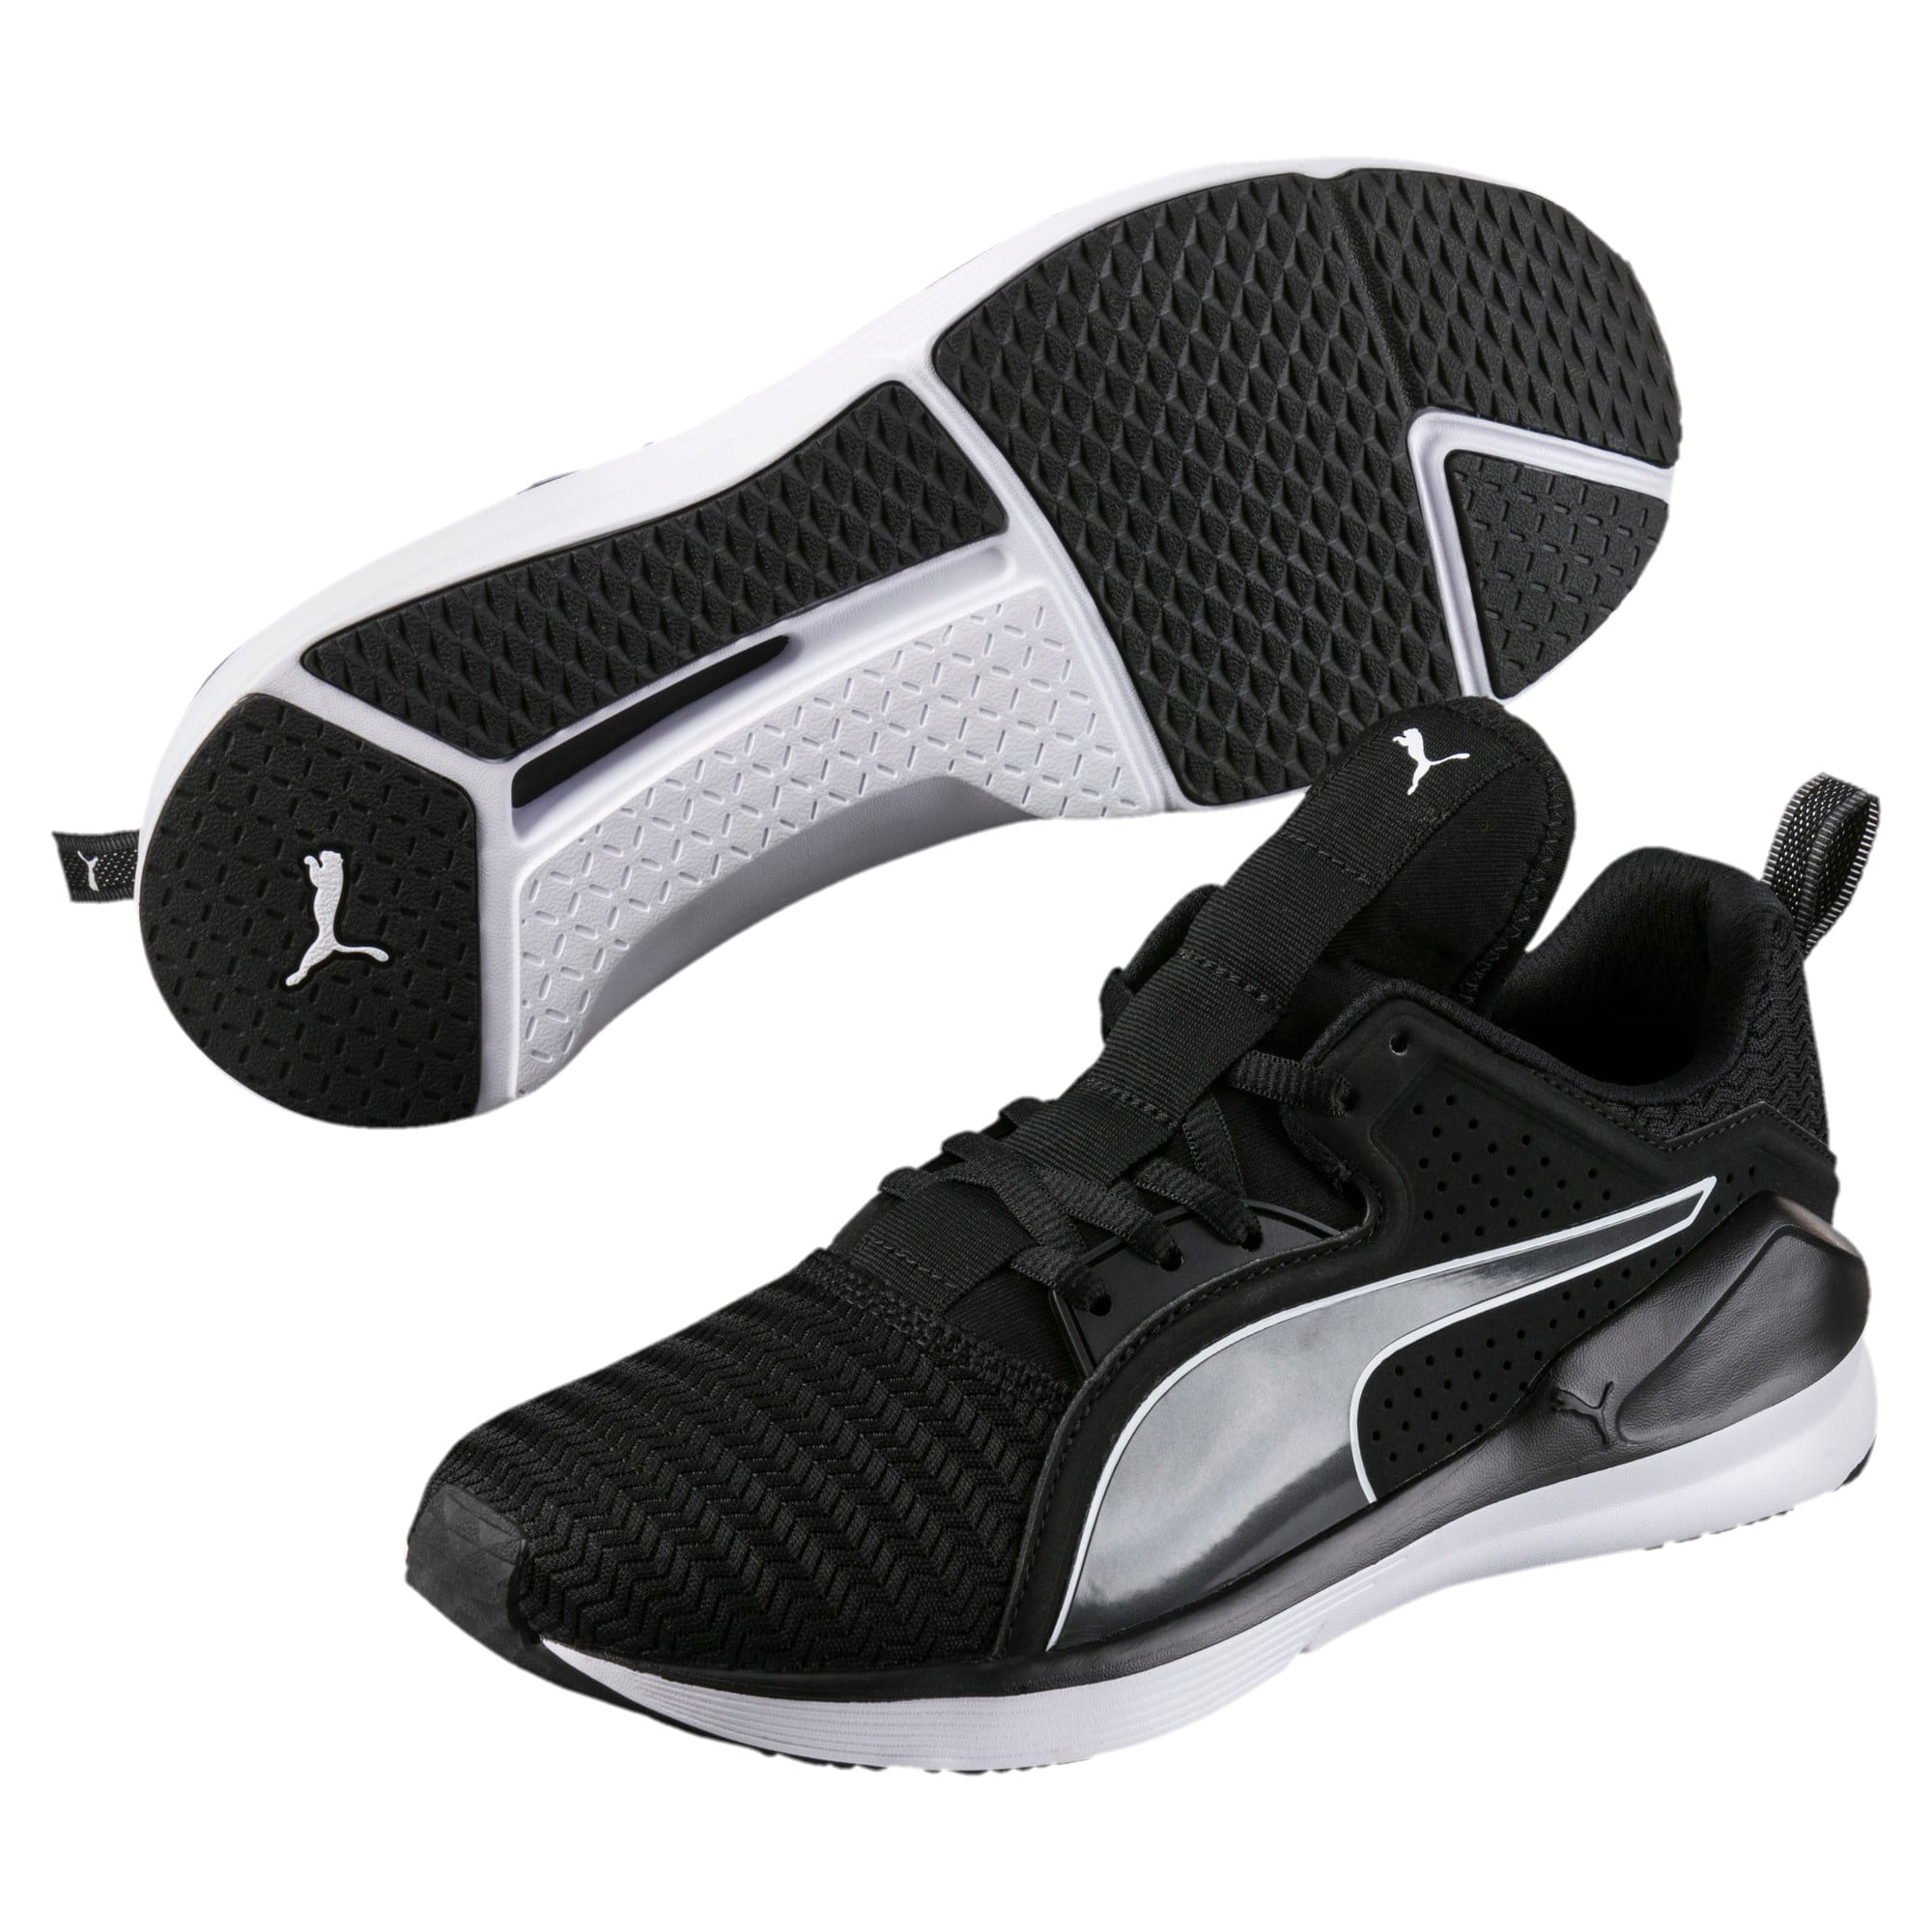 Thumbnail 2 of Fierce Lace Core Women's Training Shoes, Puma Black-Puma White, medium-IND